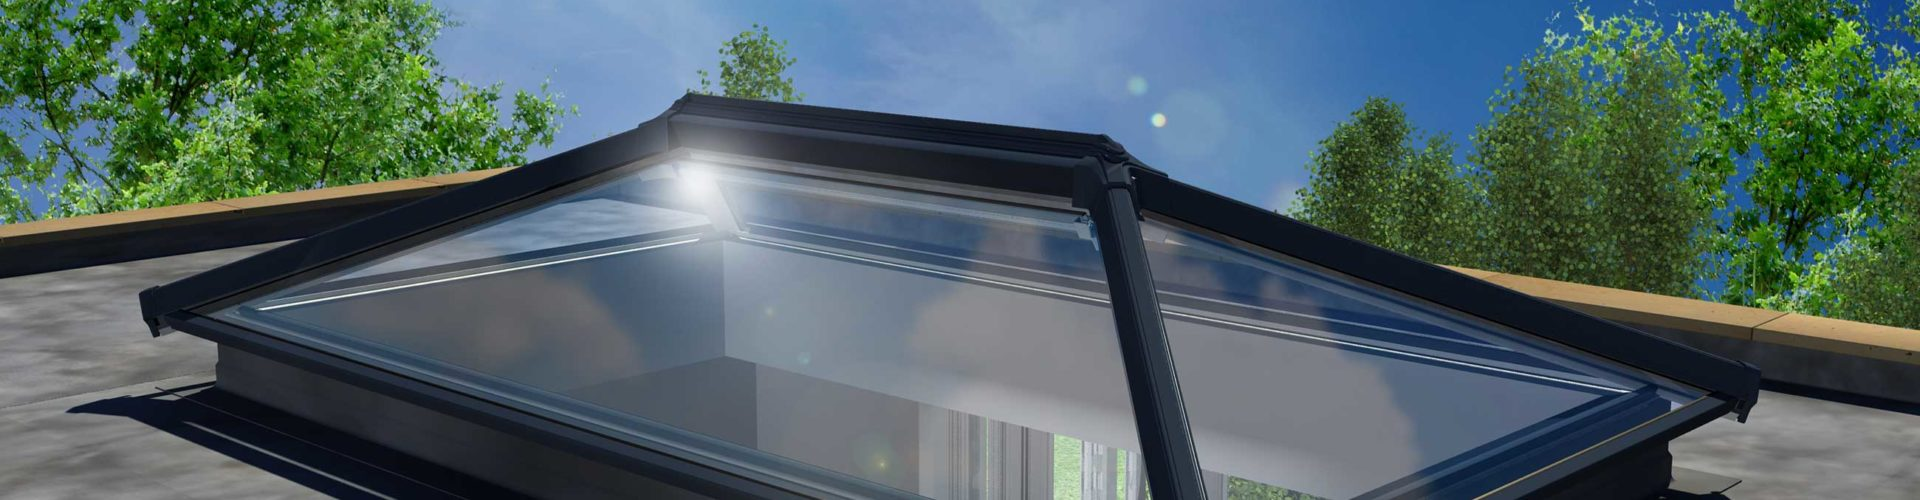 Flat Roof Lanterns, Stevenage